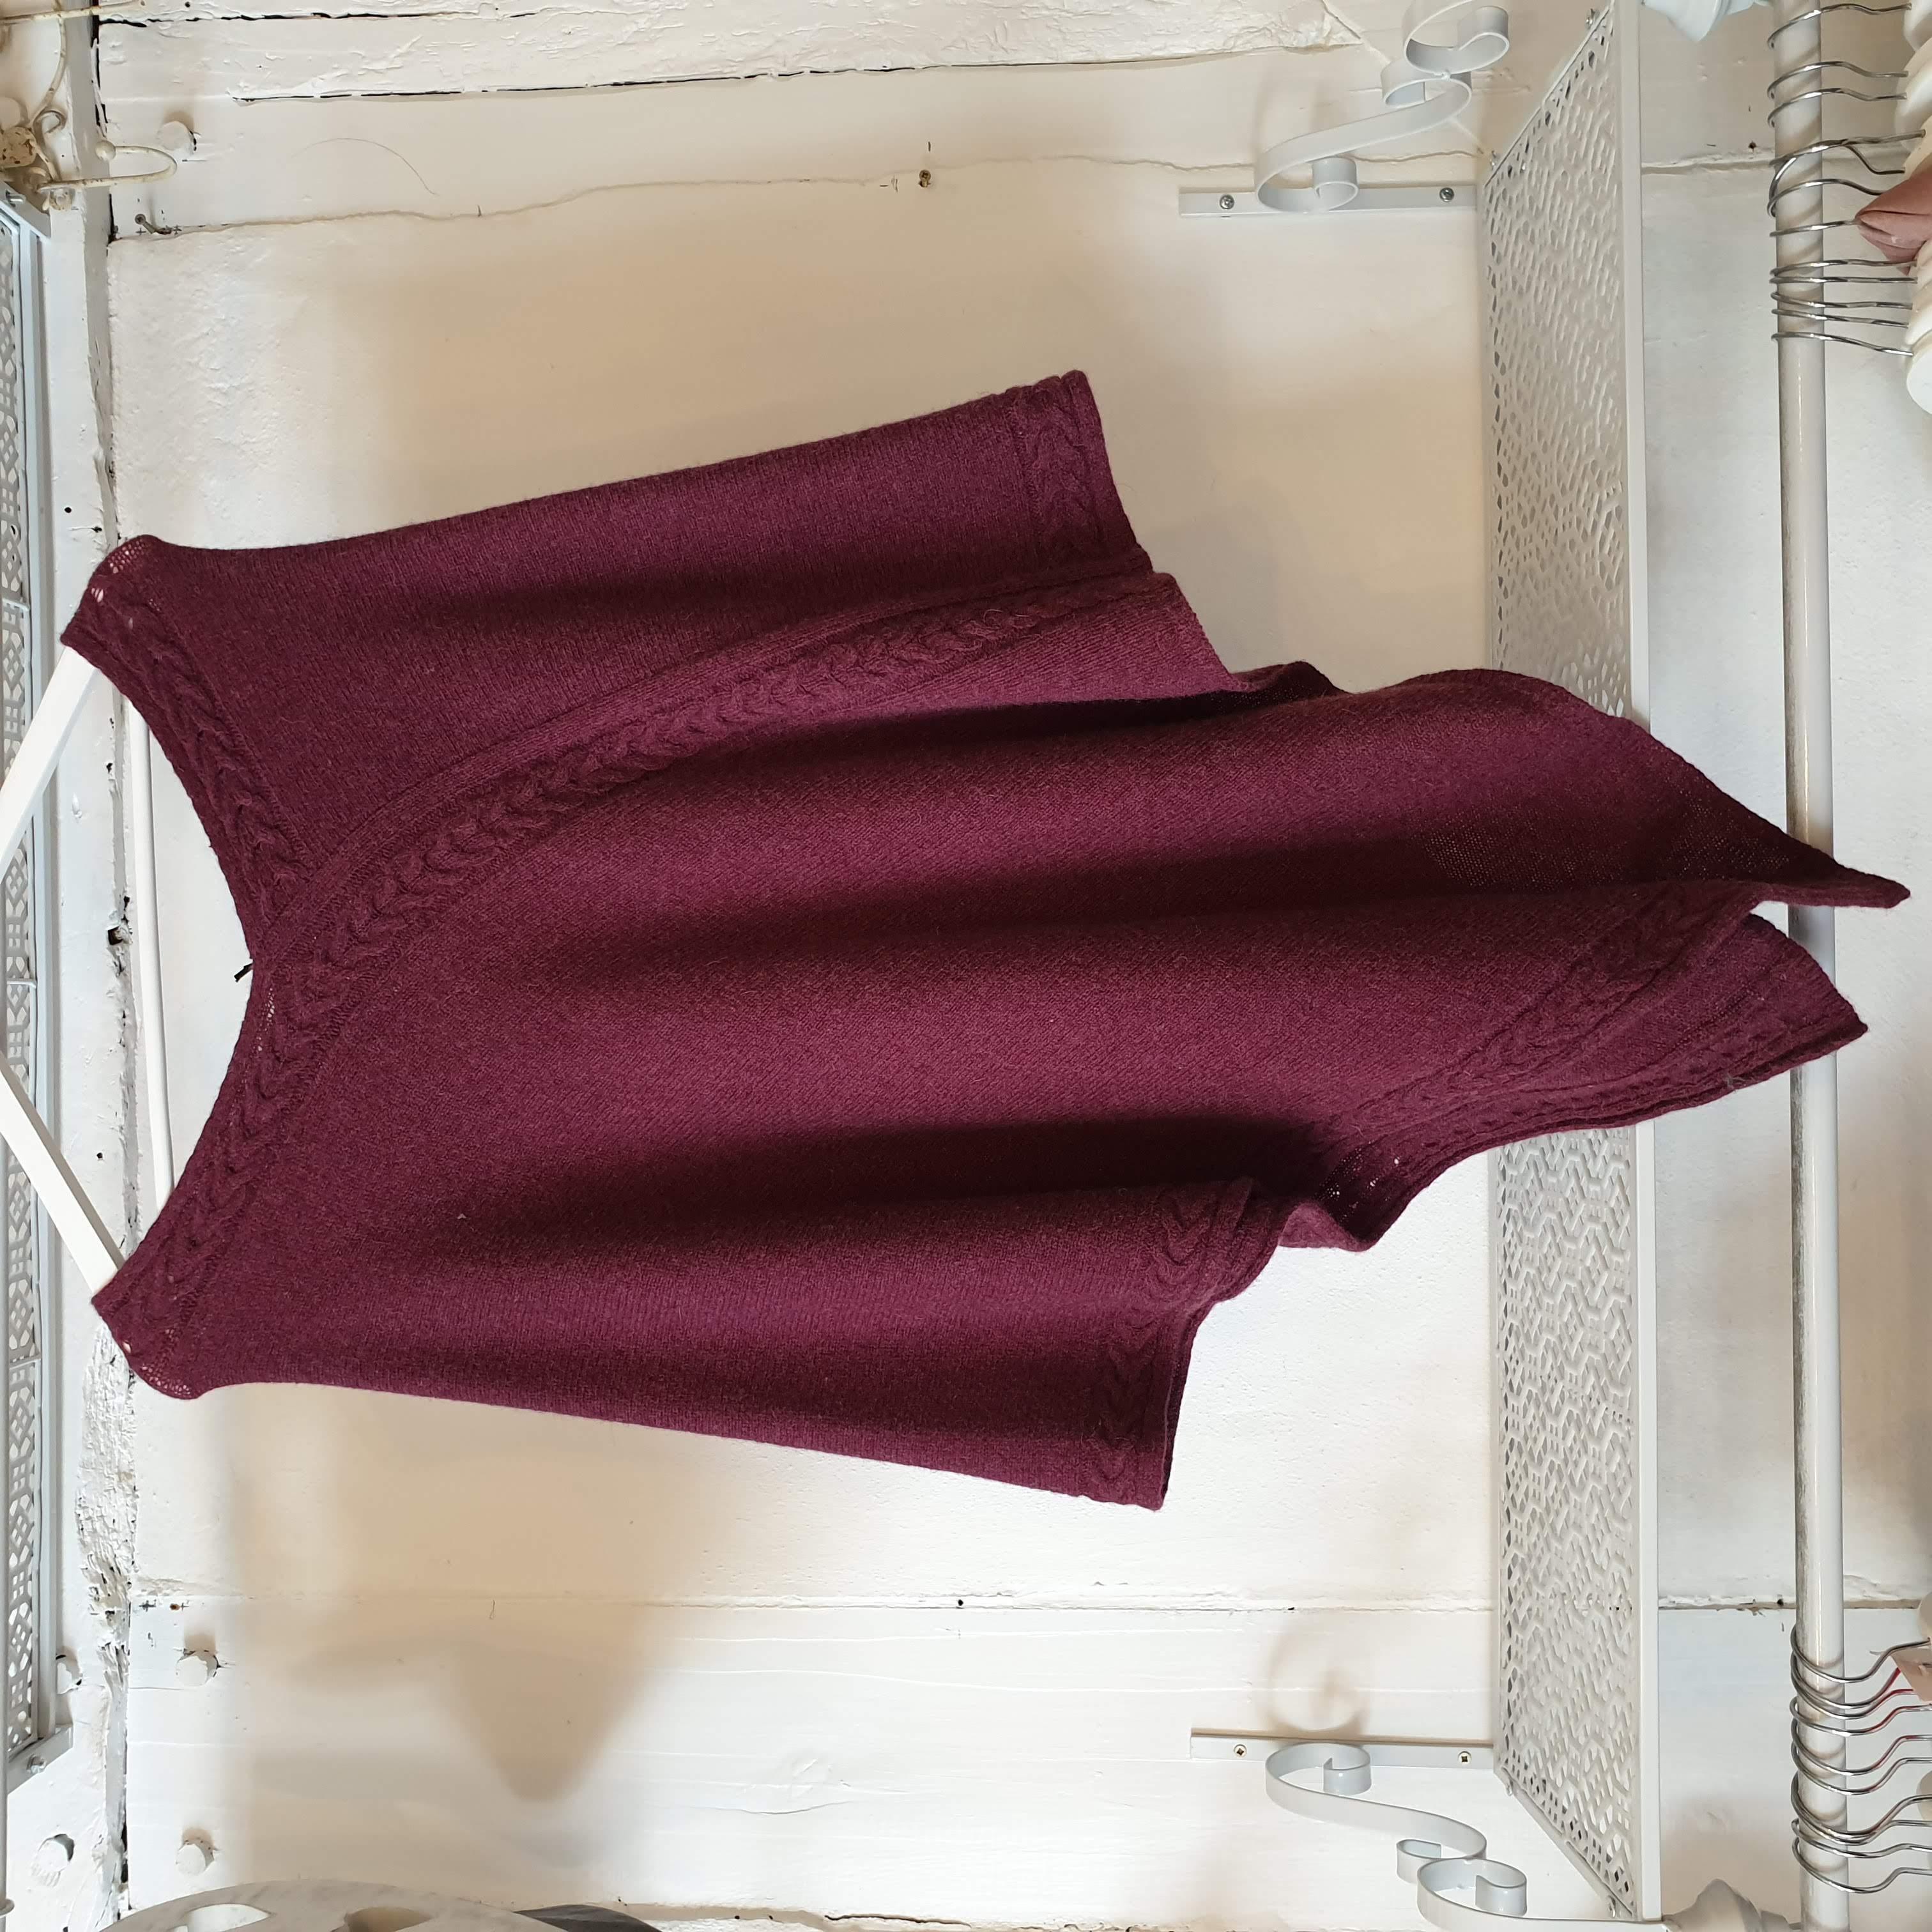 Cadenza Eco Aran Knit Damson Poncho